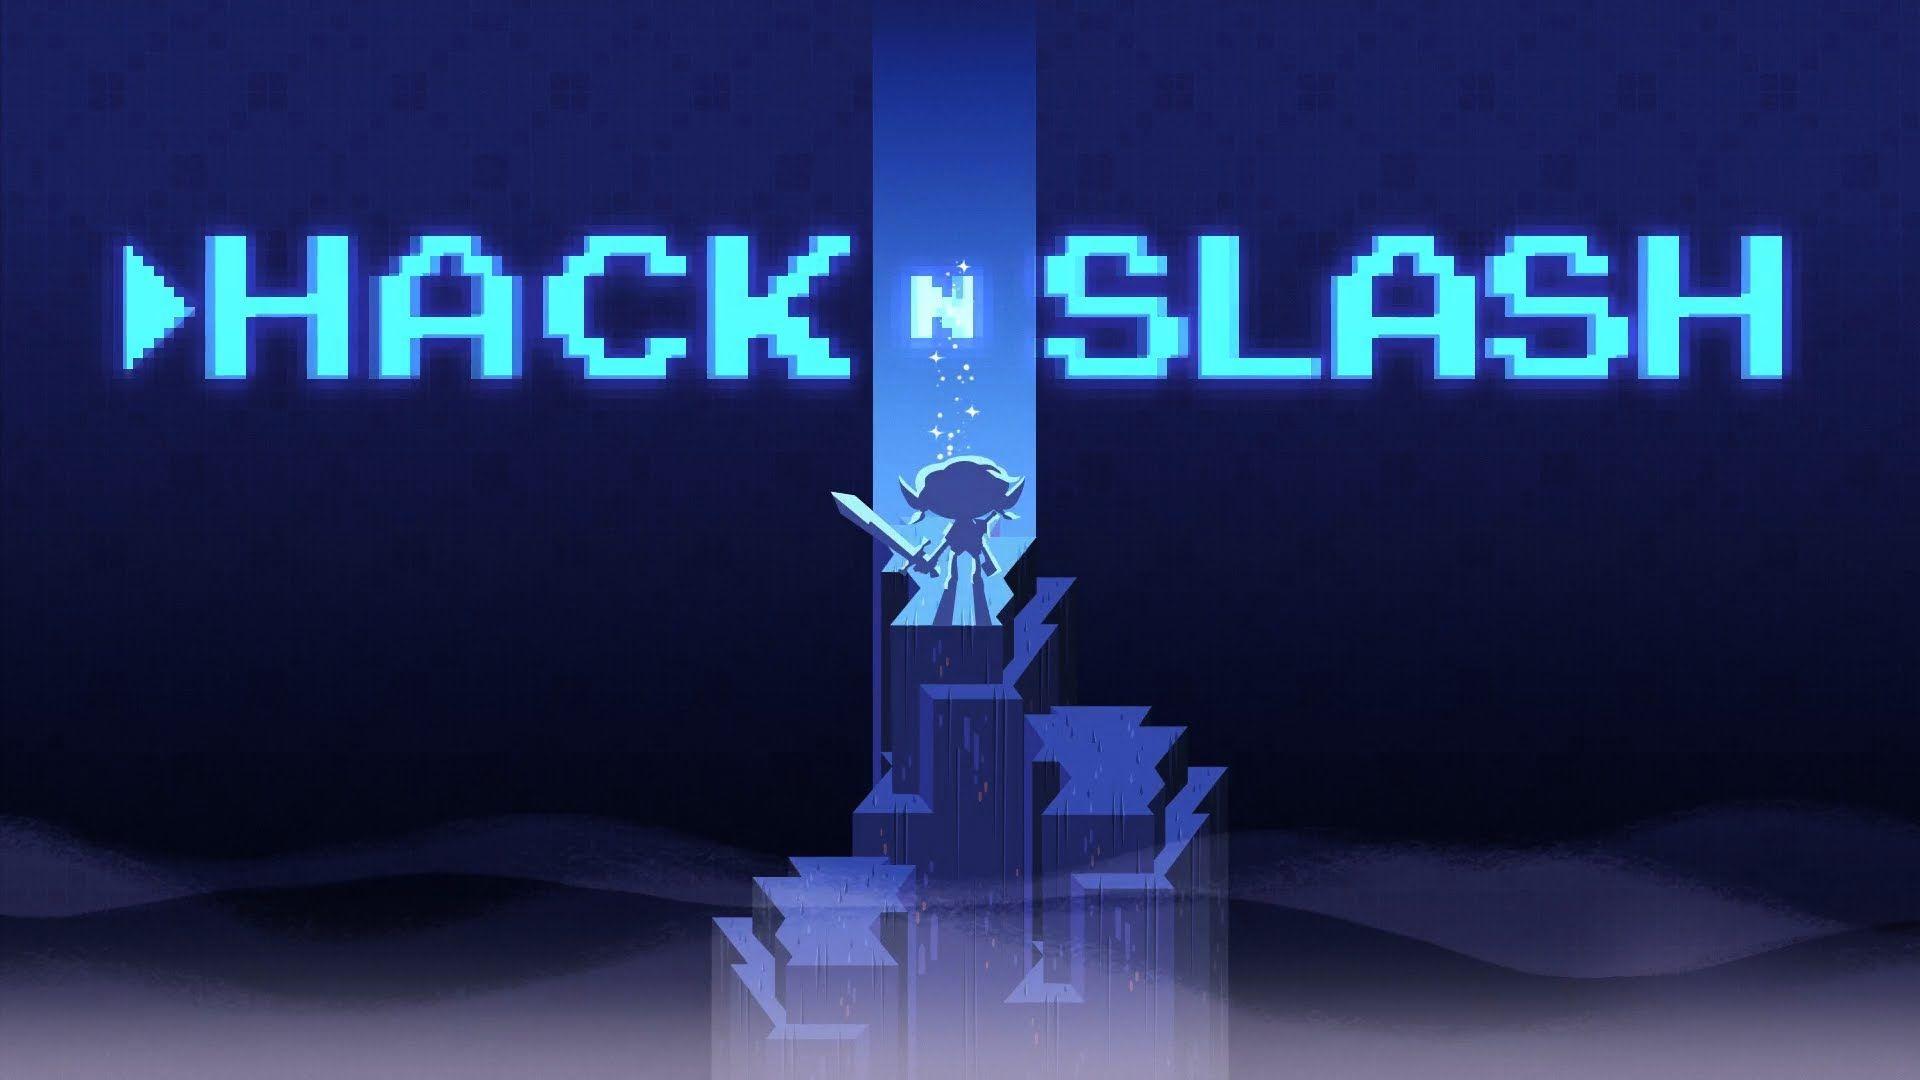 Hack 'n' Slash Early Access Launch Trailer